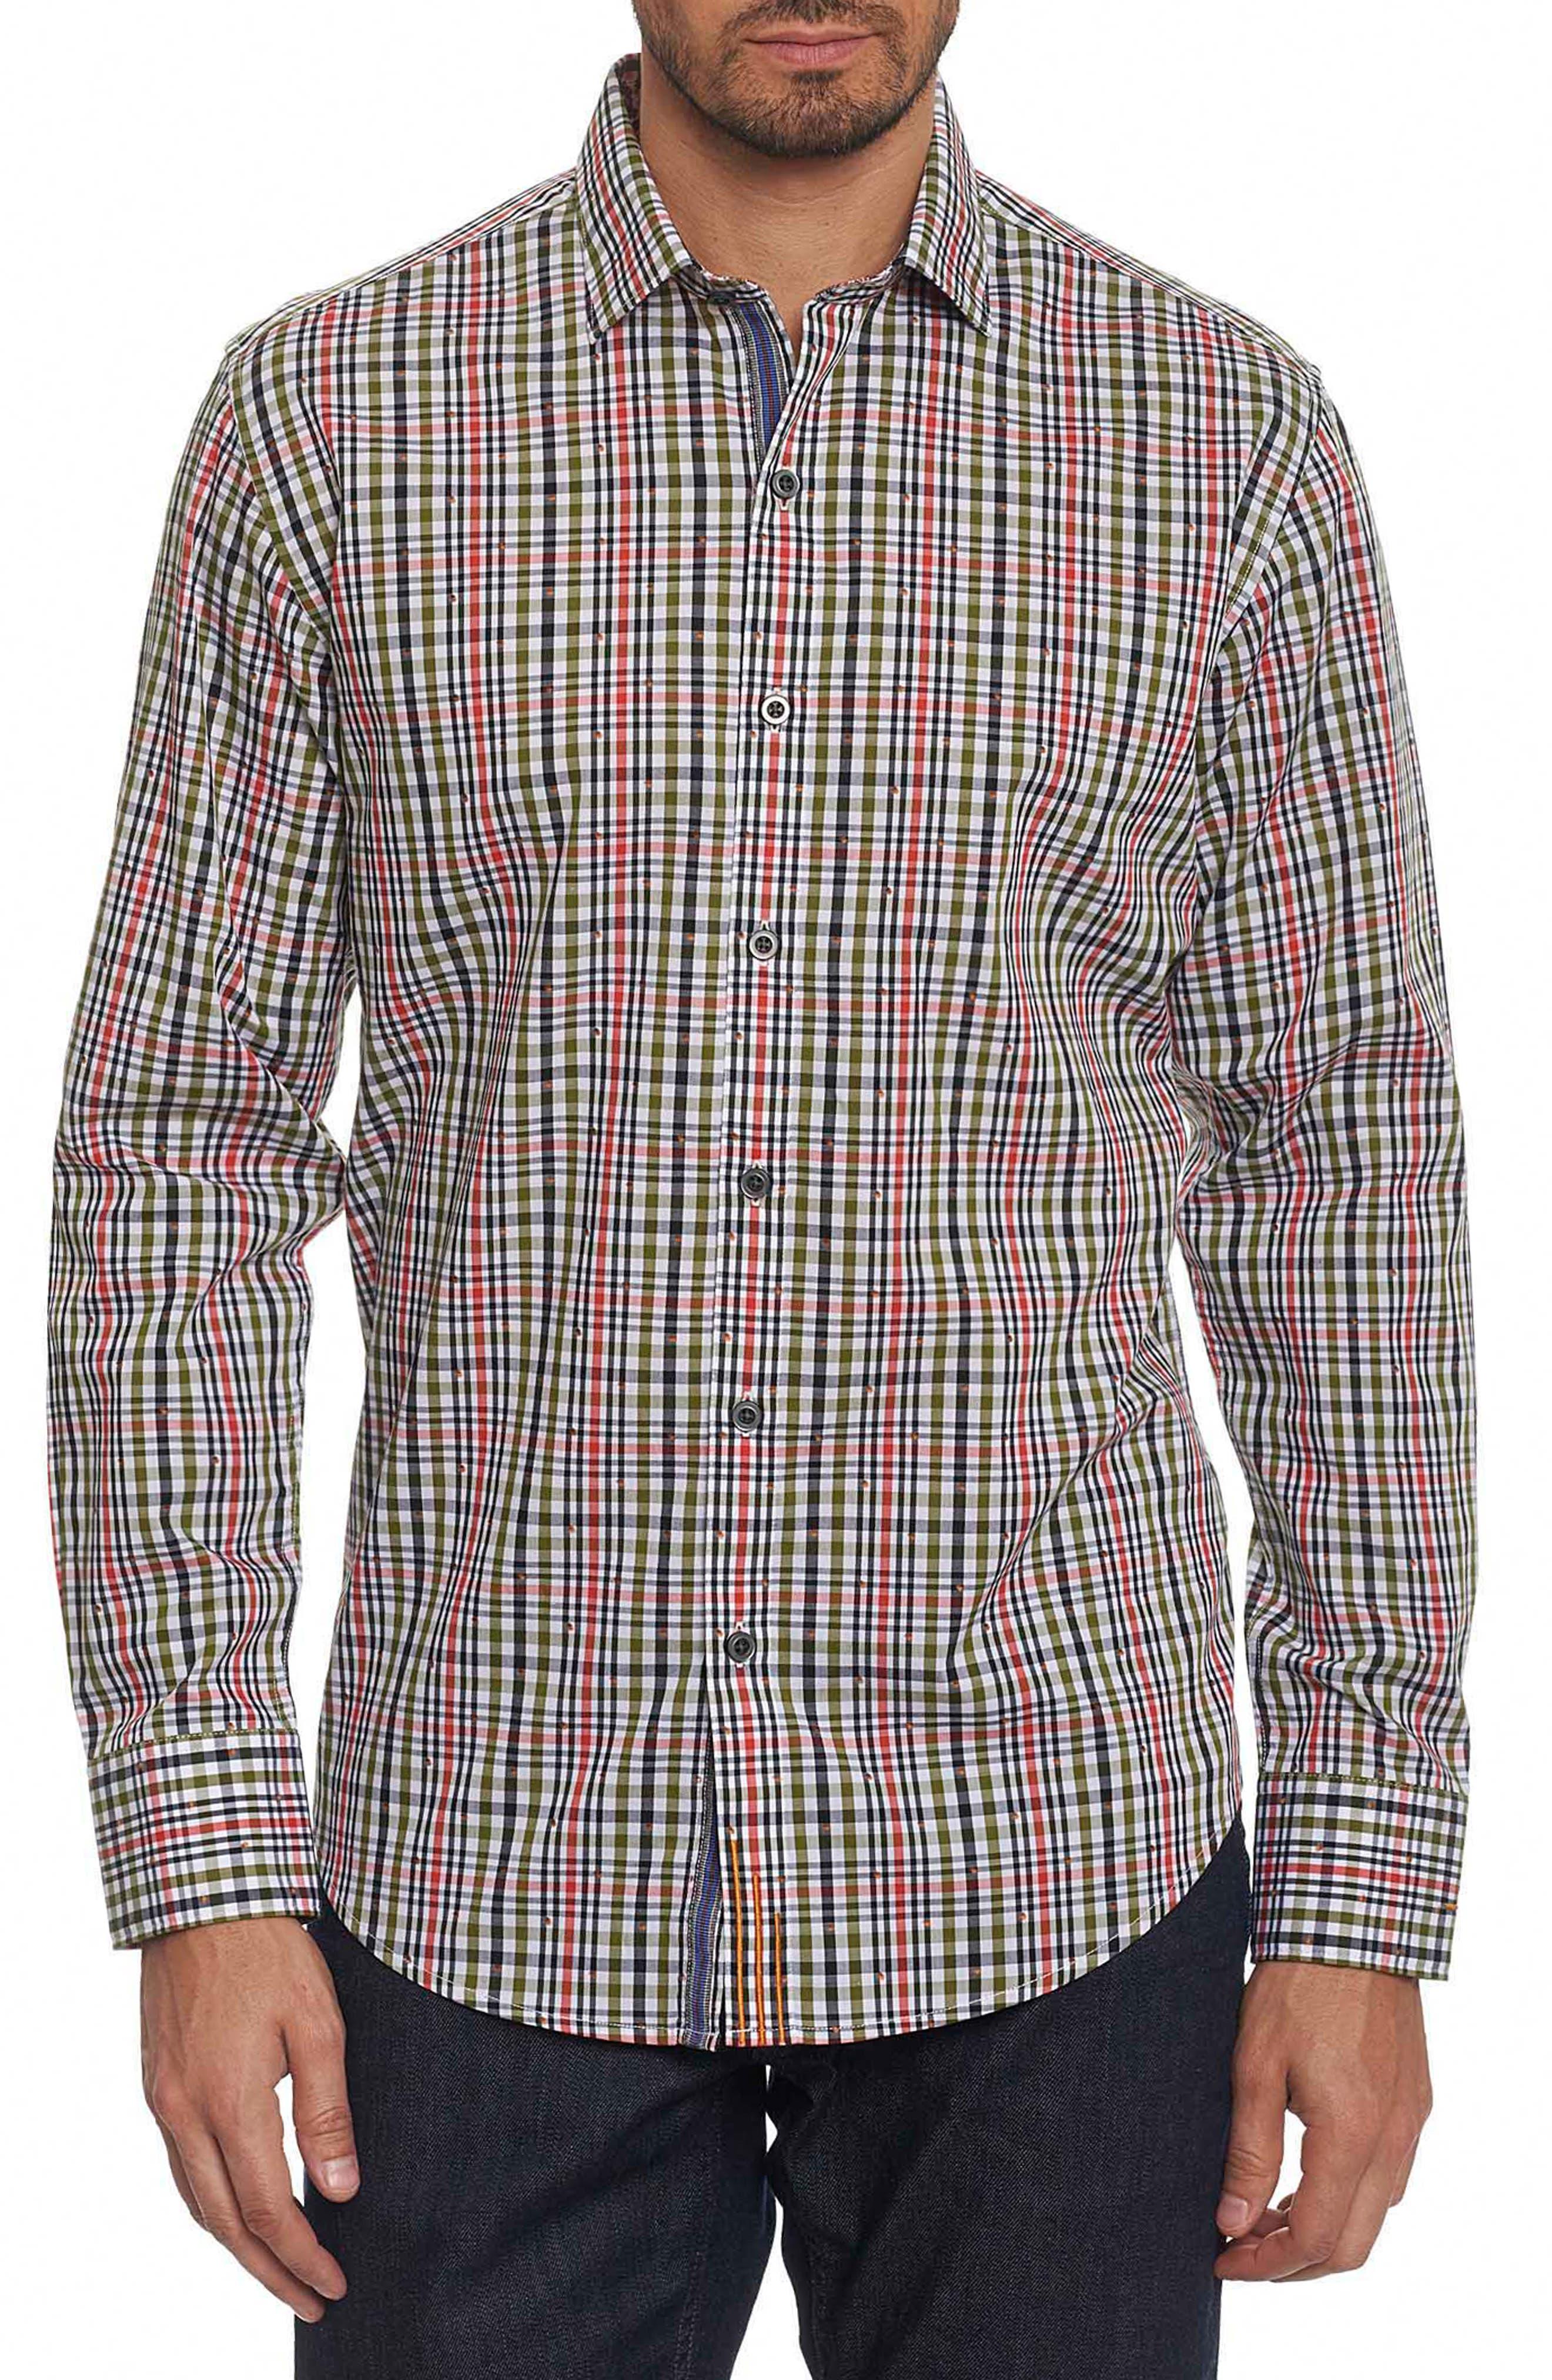 Main Image - Robert Graham Cape Vincent Classic Fit Dobby Check Sport Shirt